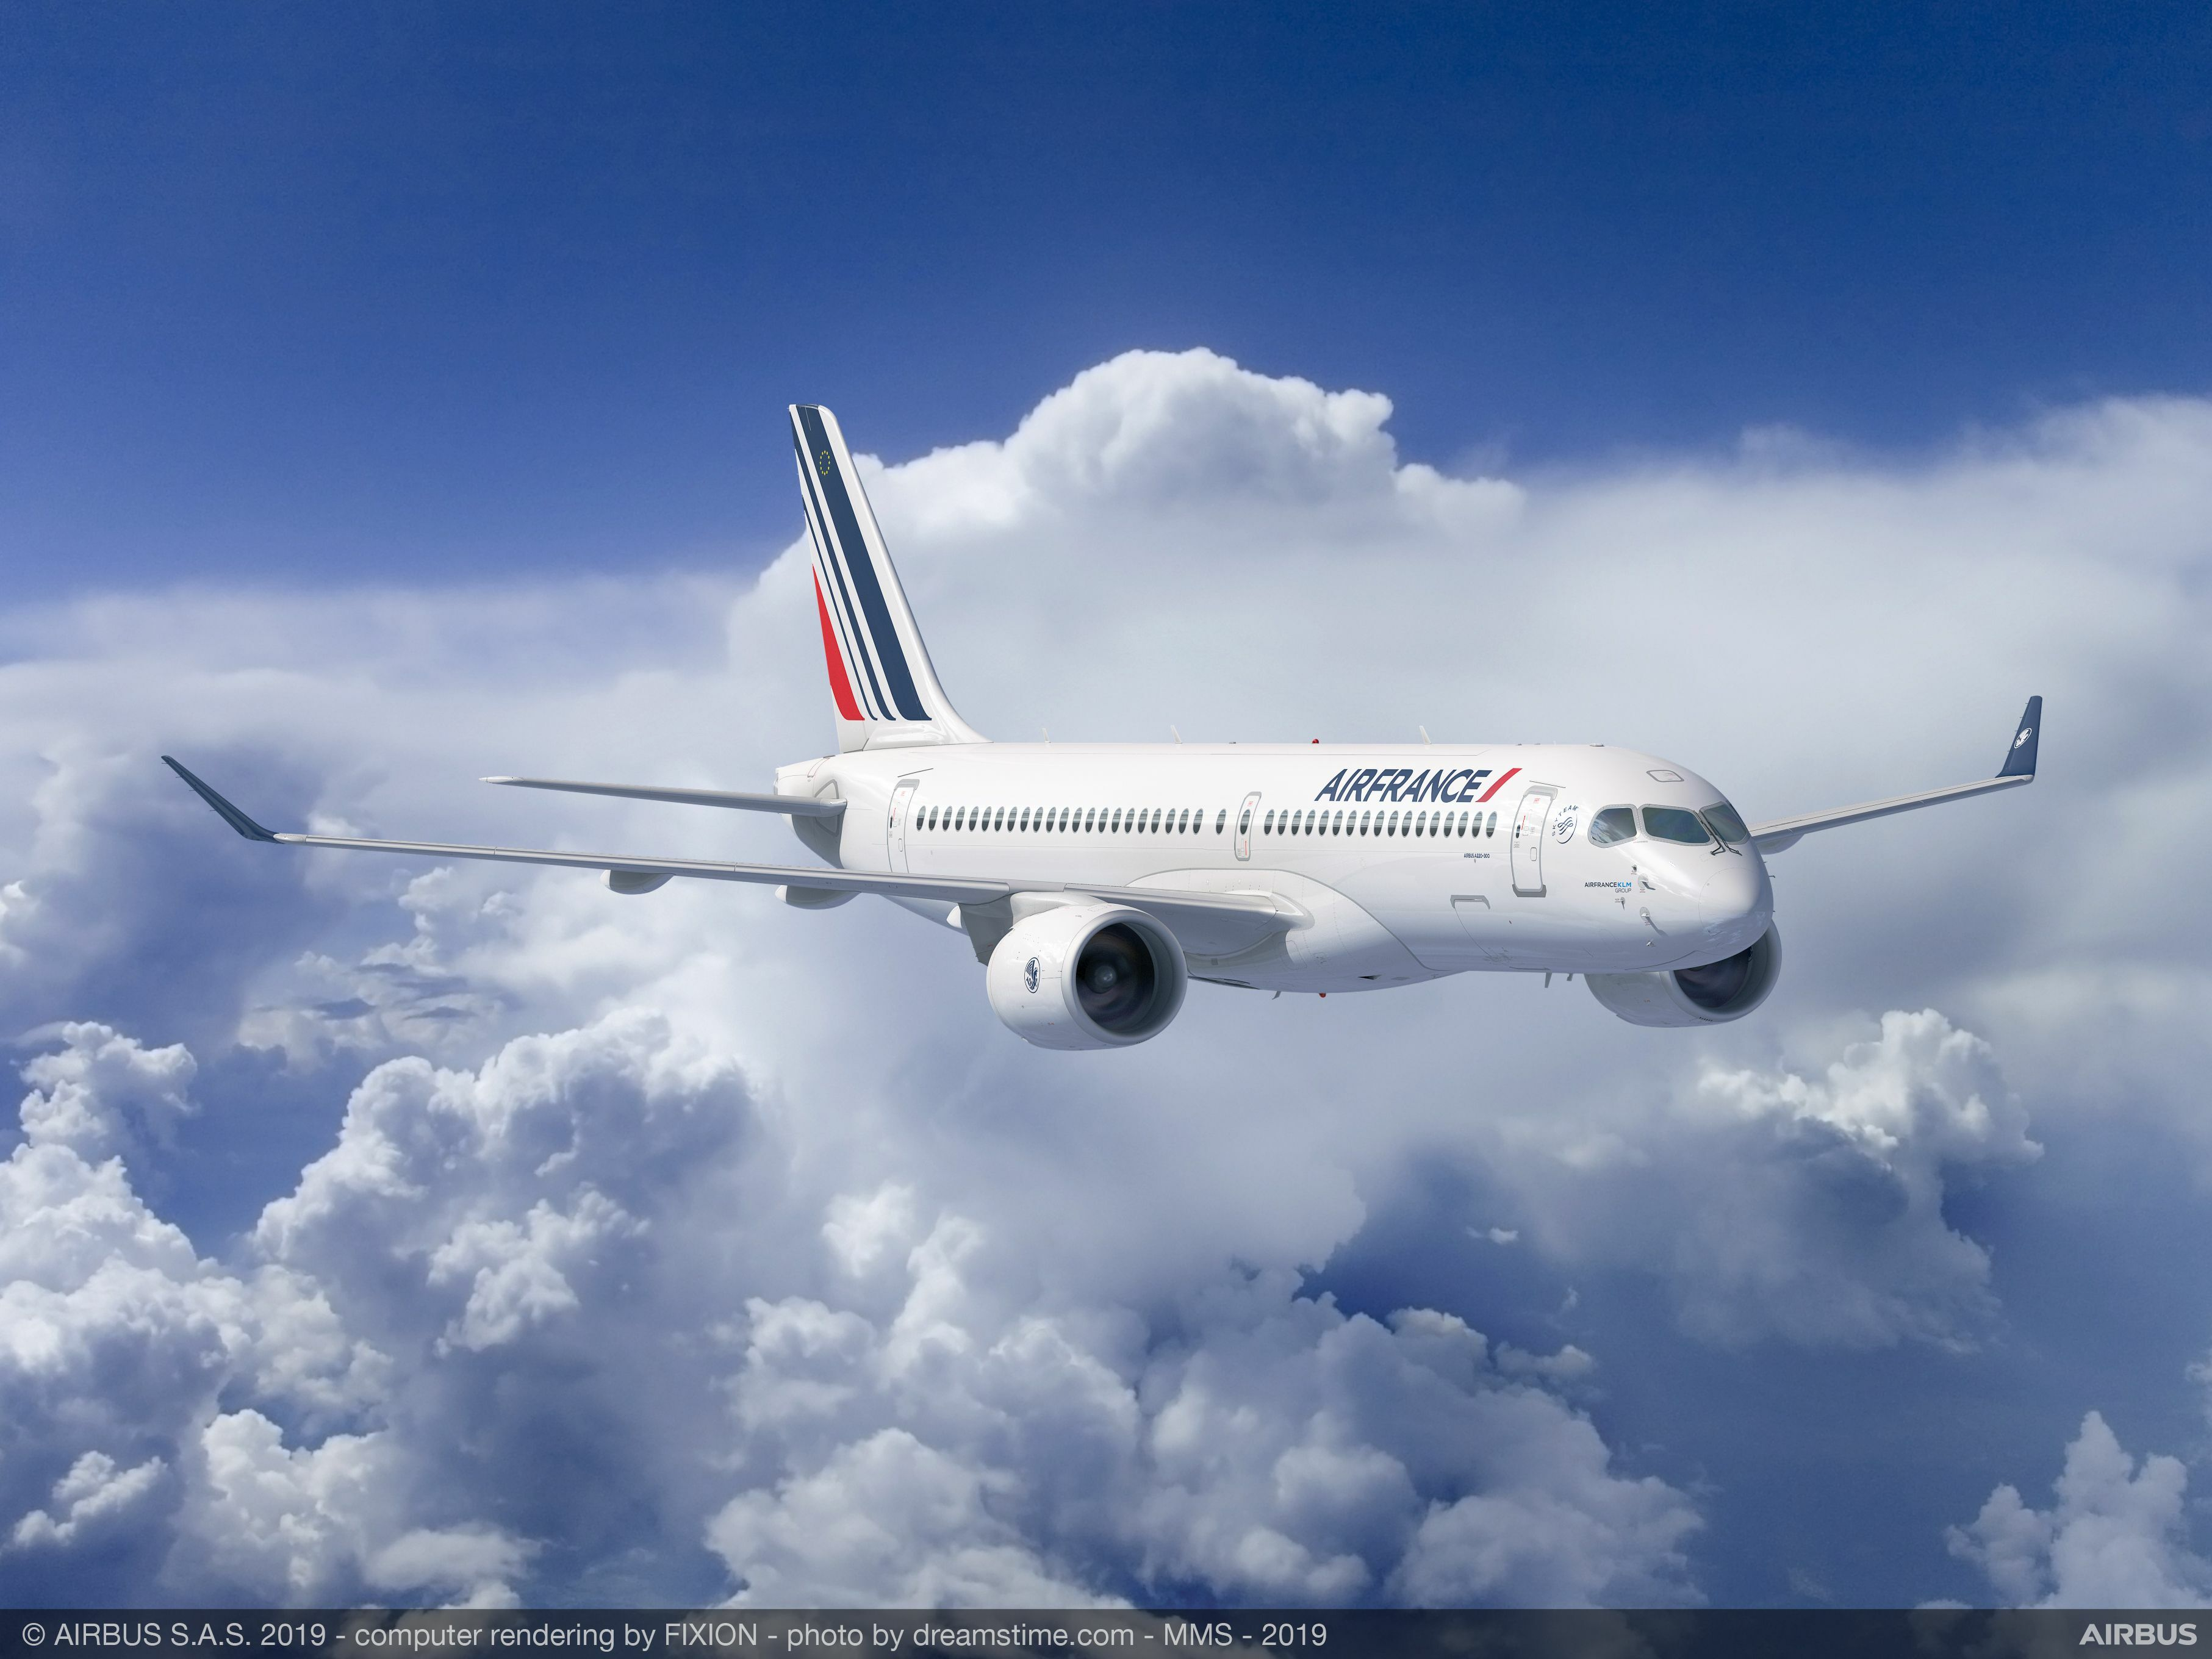 Investing heavily in sustainable aviation fuels   Investir massivement dans les carburants alternatifs durables pour l'aviation